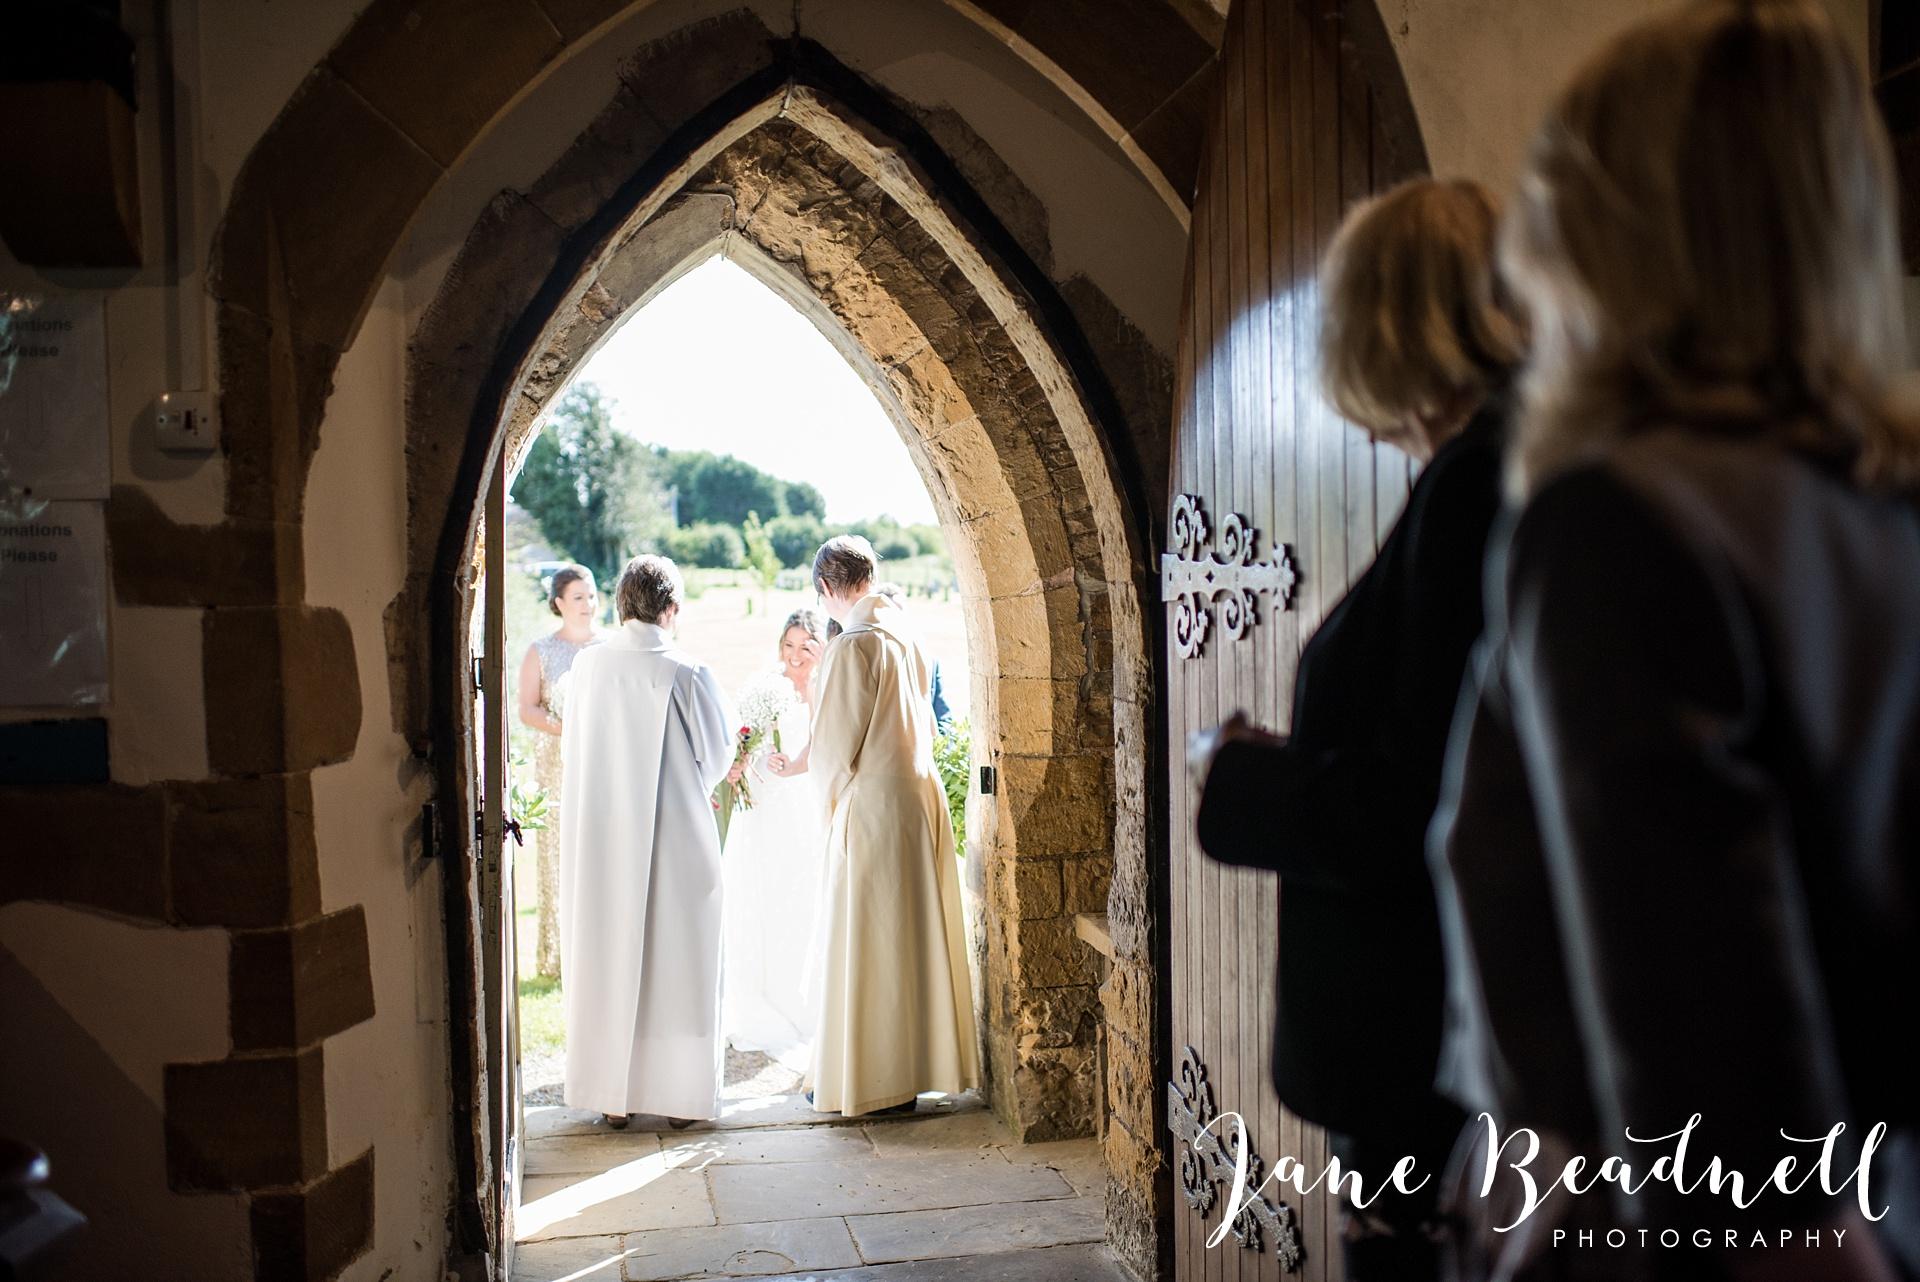 fine-art-wedding-photographer-jane-beadnell-yorkshire-wedding-photographer_0045